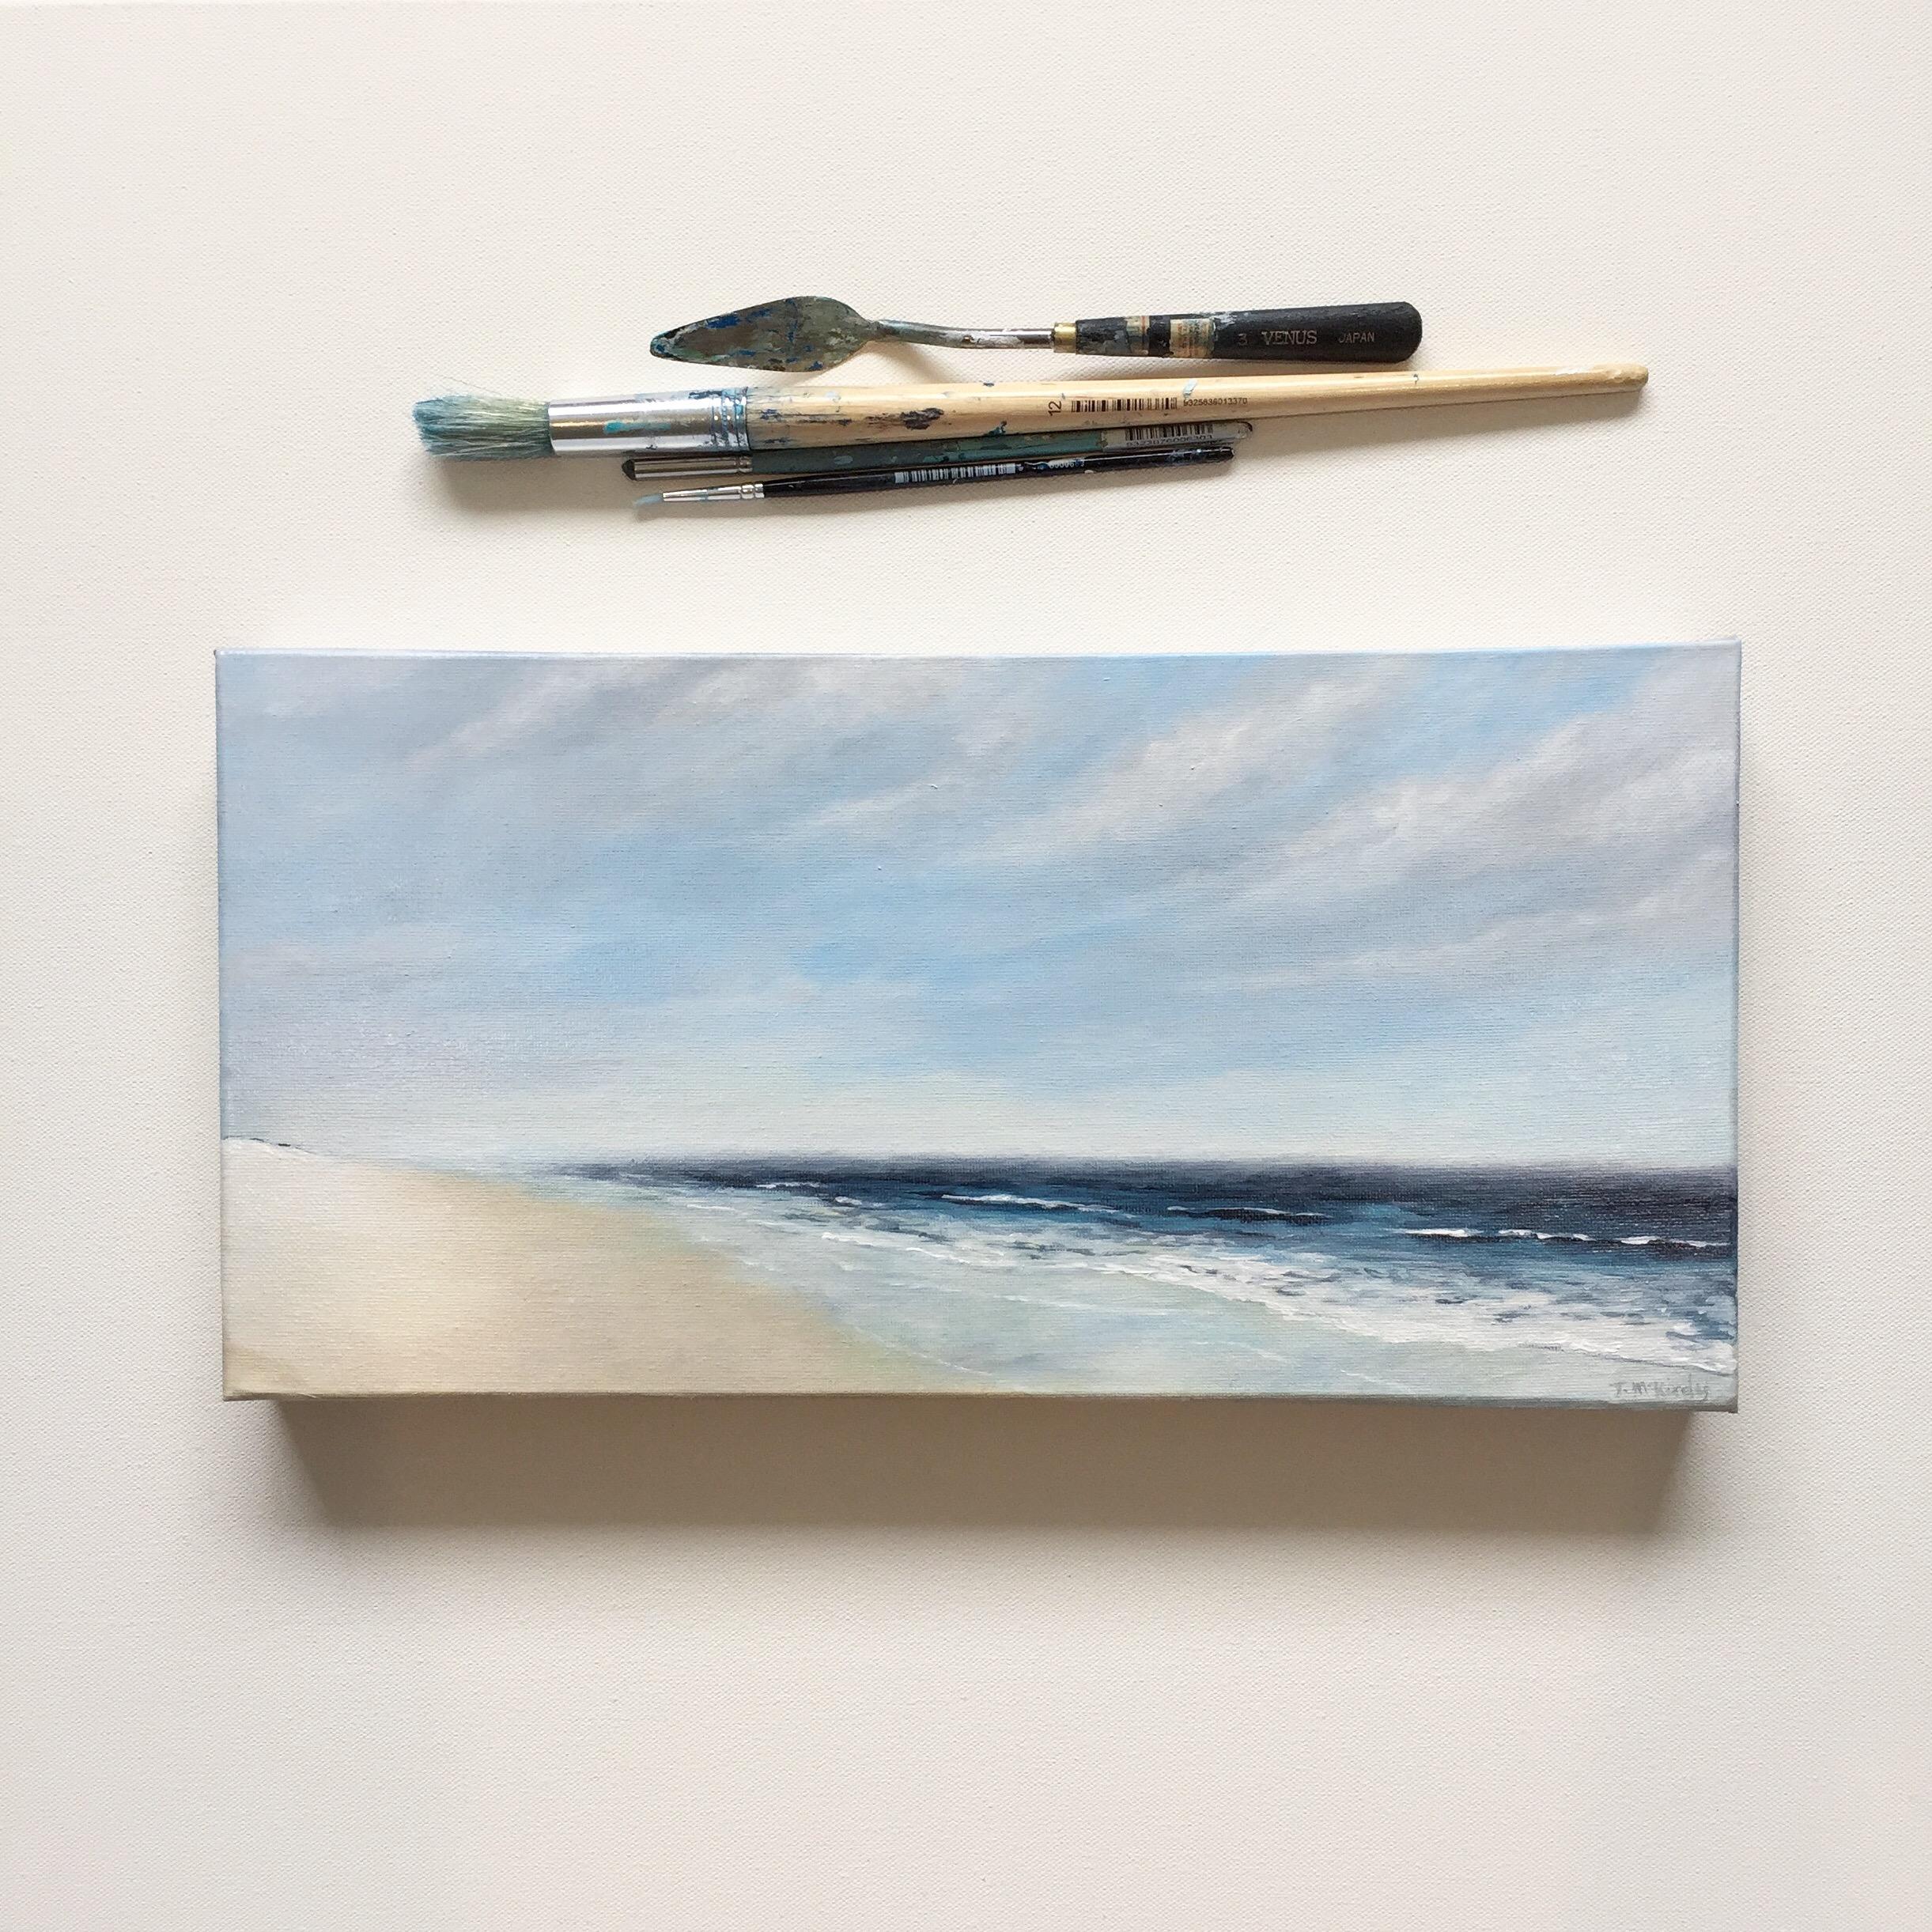 Autumn Skies - SOLDAcrylic on canvas.410 x 210mm